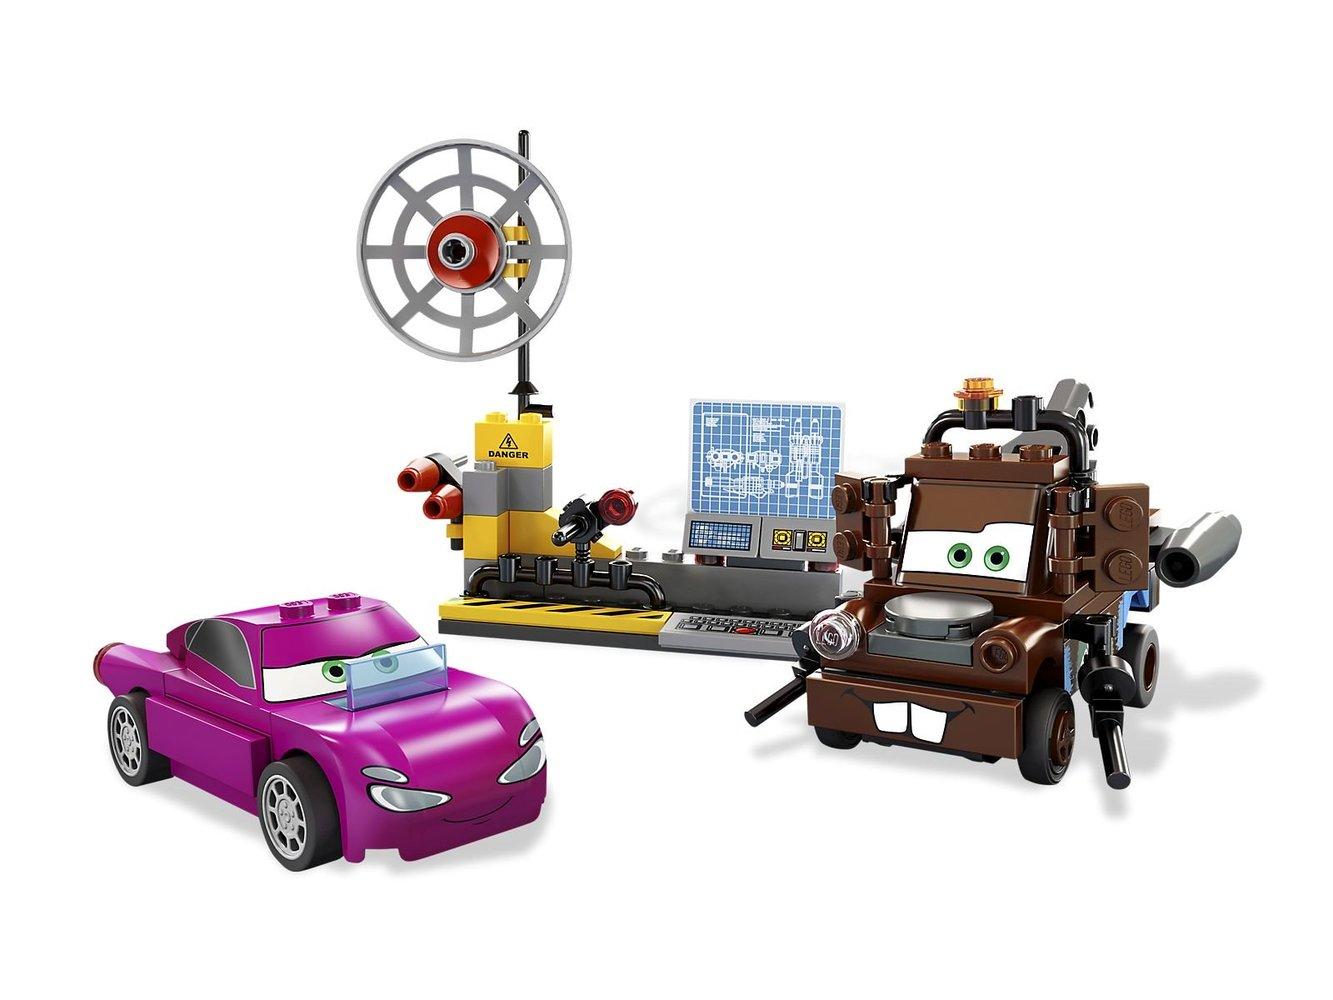 Mater's Spy Zone